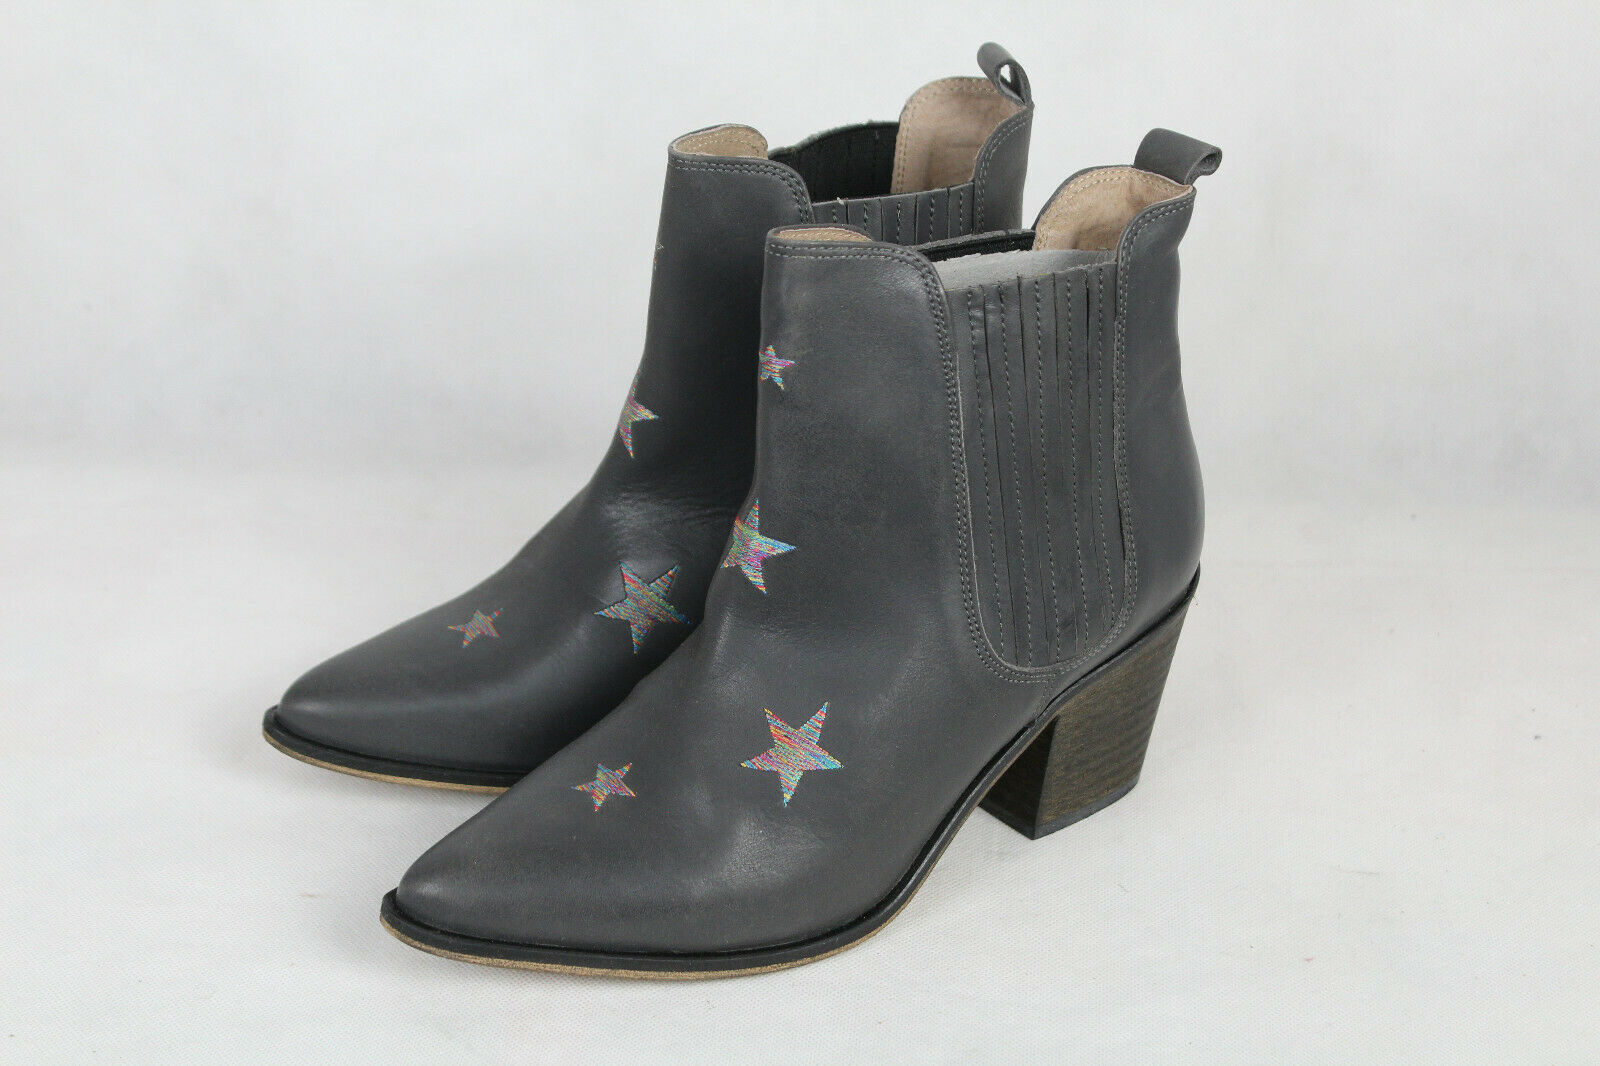 Heine cuero-botines chelsea-botas damas, talla 39,neu, LP